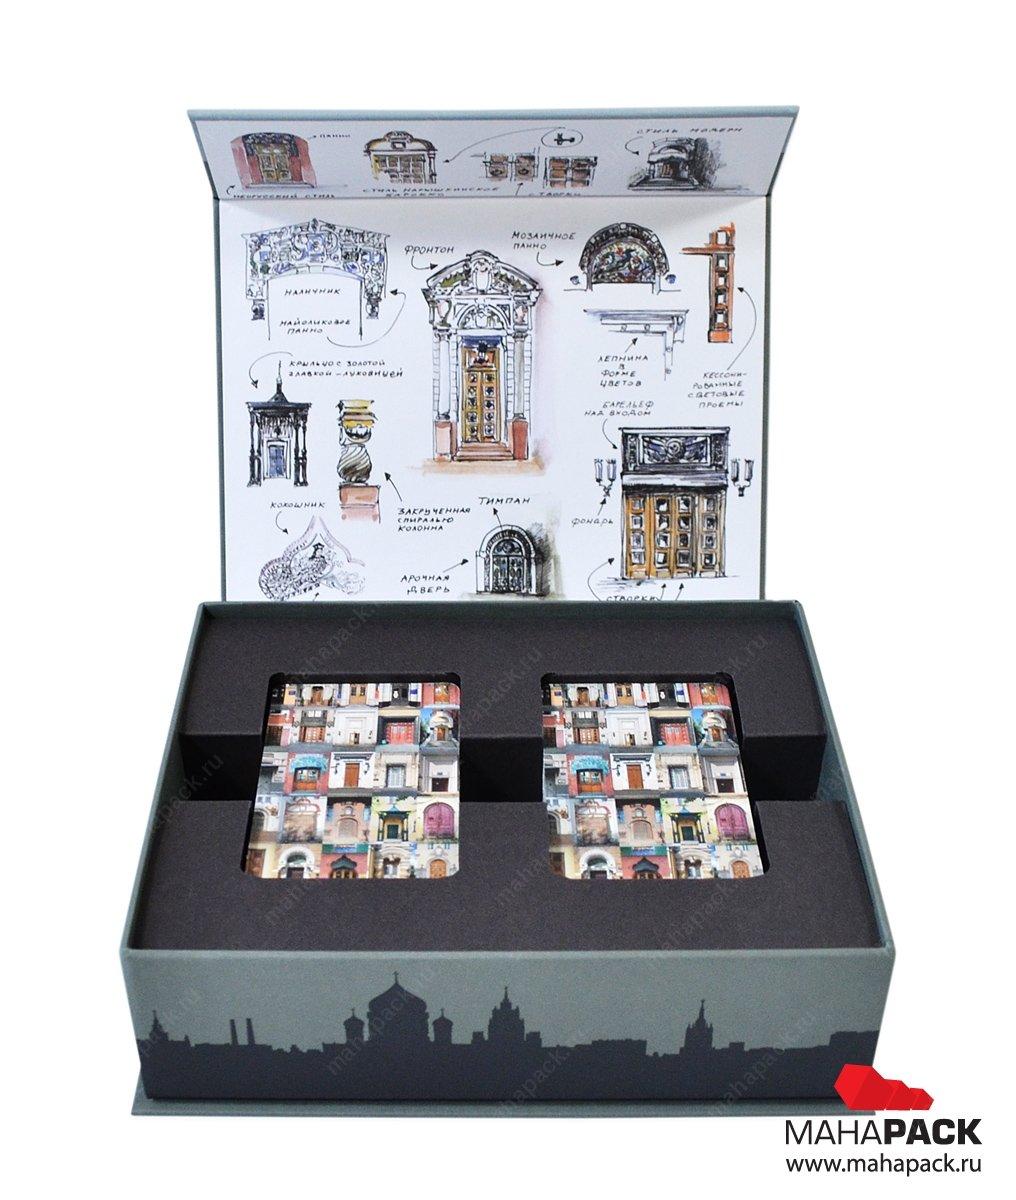 Производство подарочных коробок на заказ